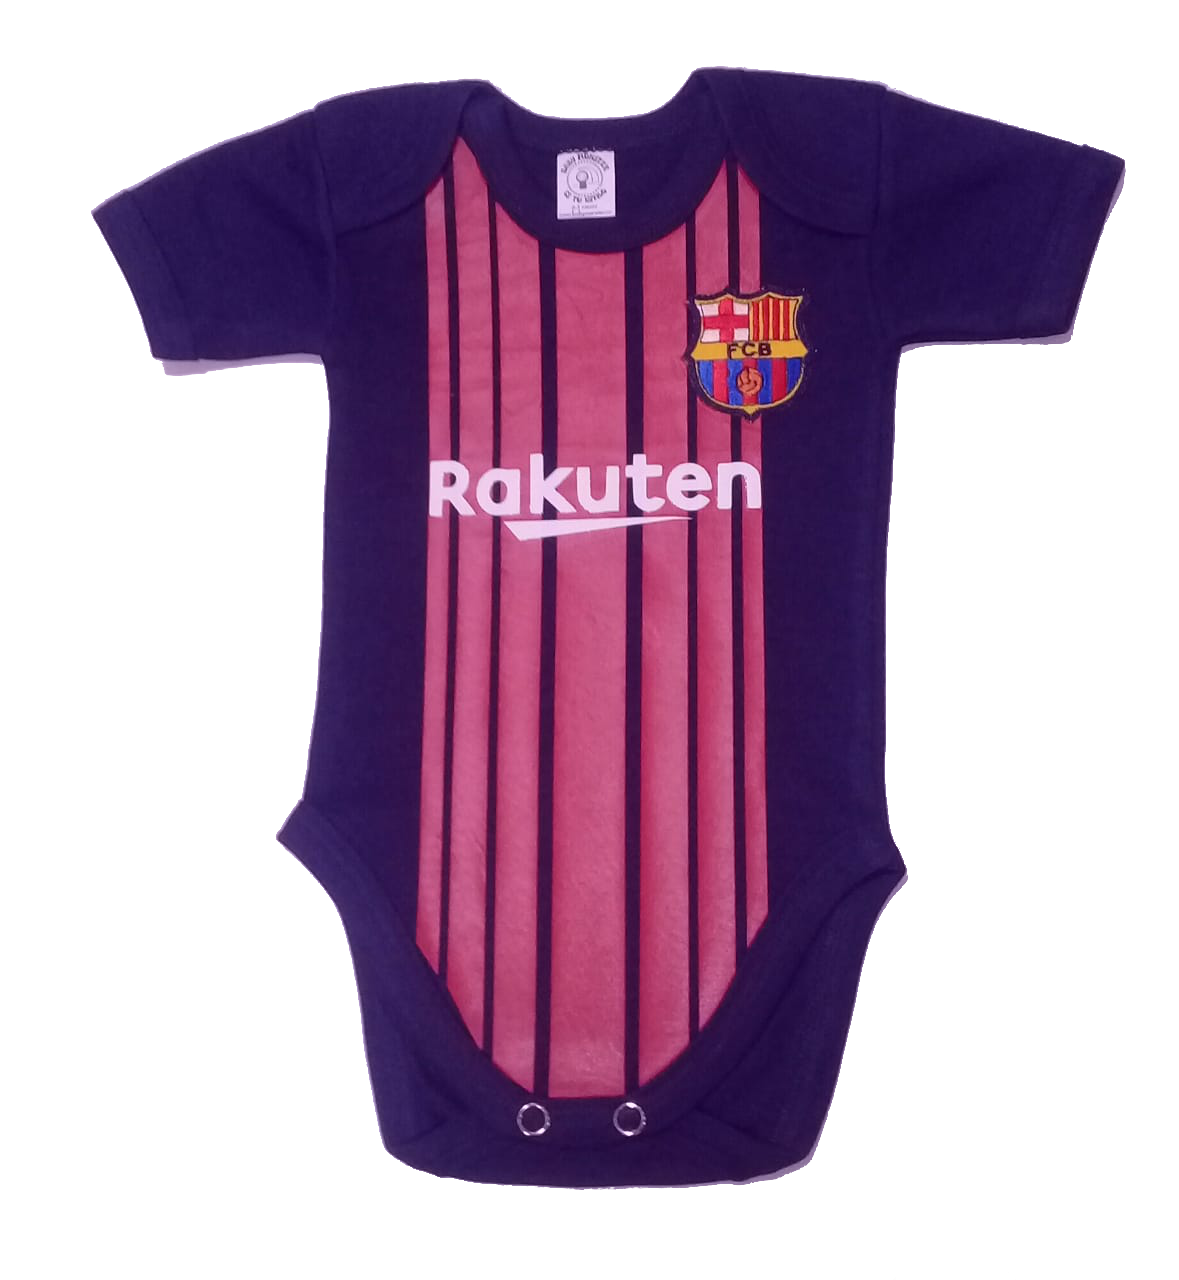 Ropa para bebe body bodie futbol barcelona baby monster png 1179x1280 Ropa  de bebe barcelona 8fca6aa09e2